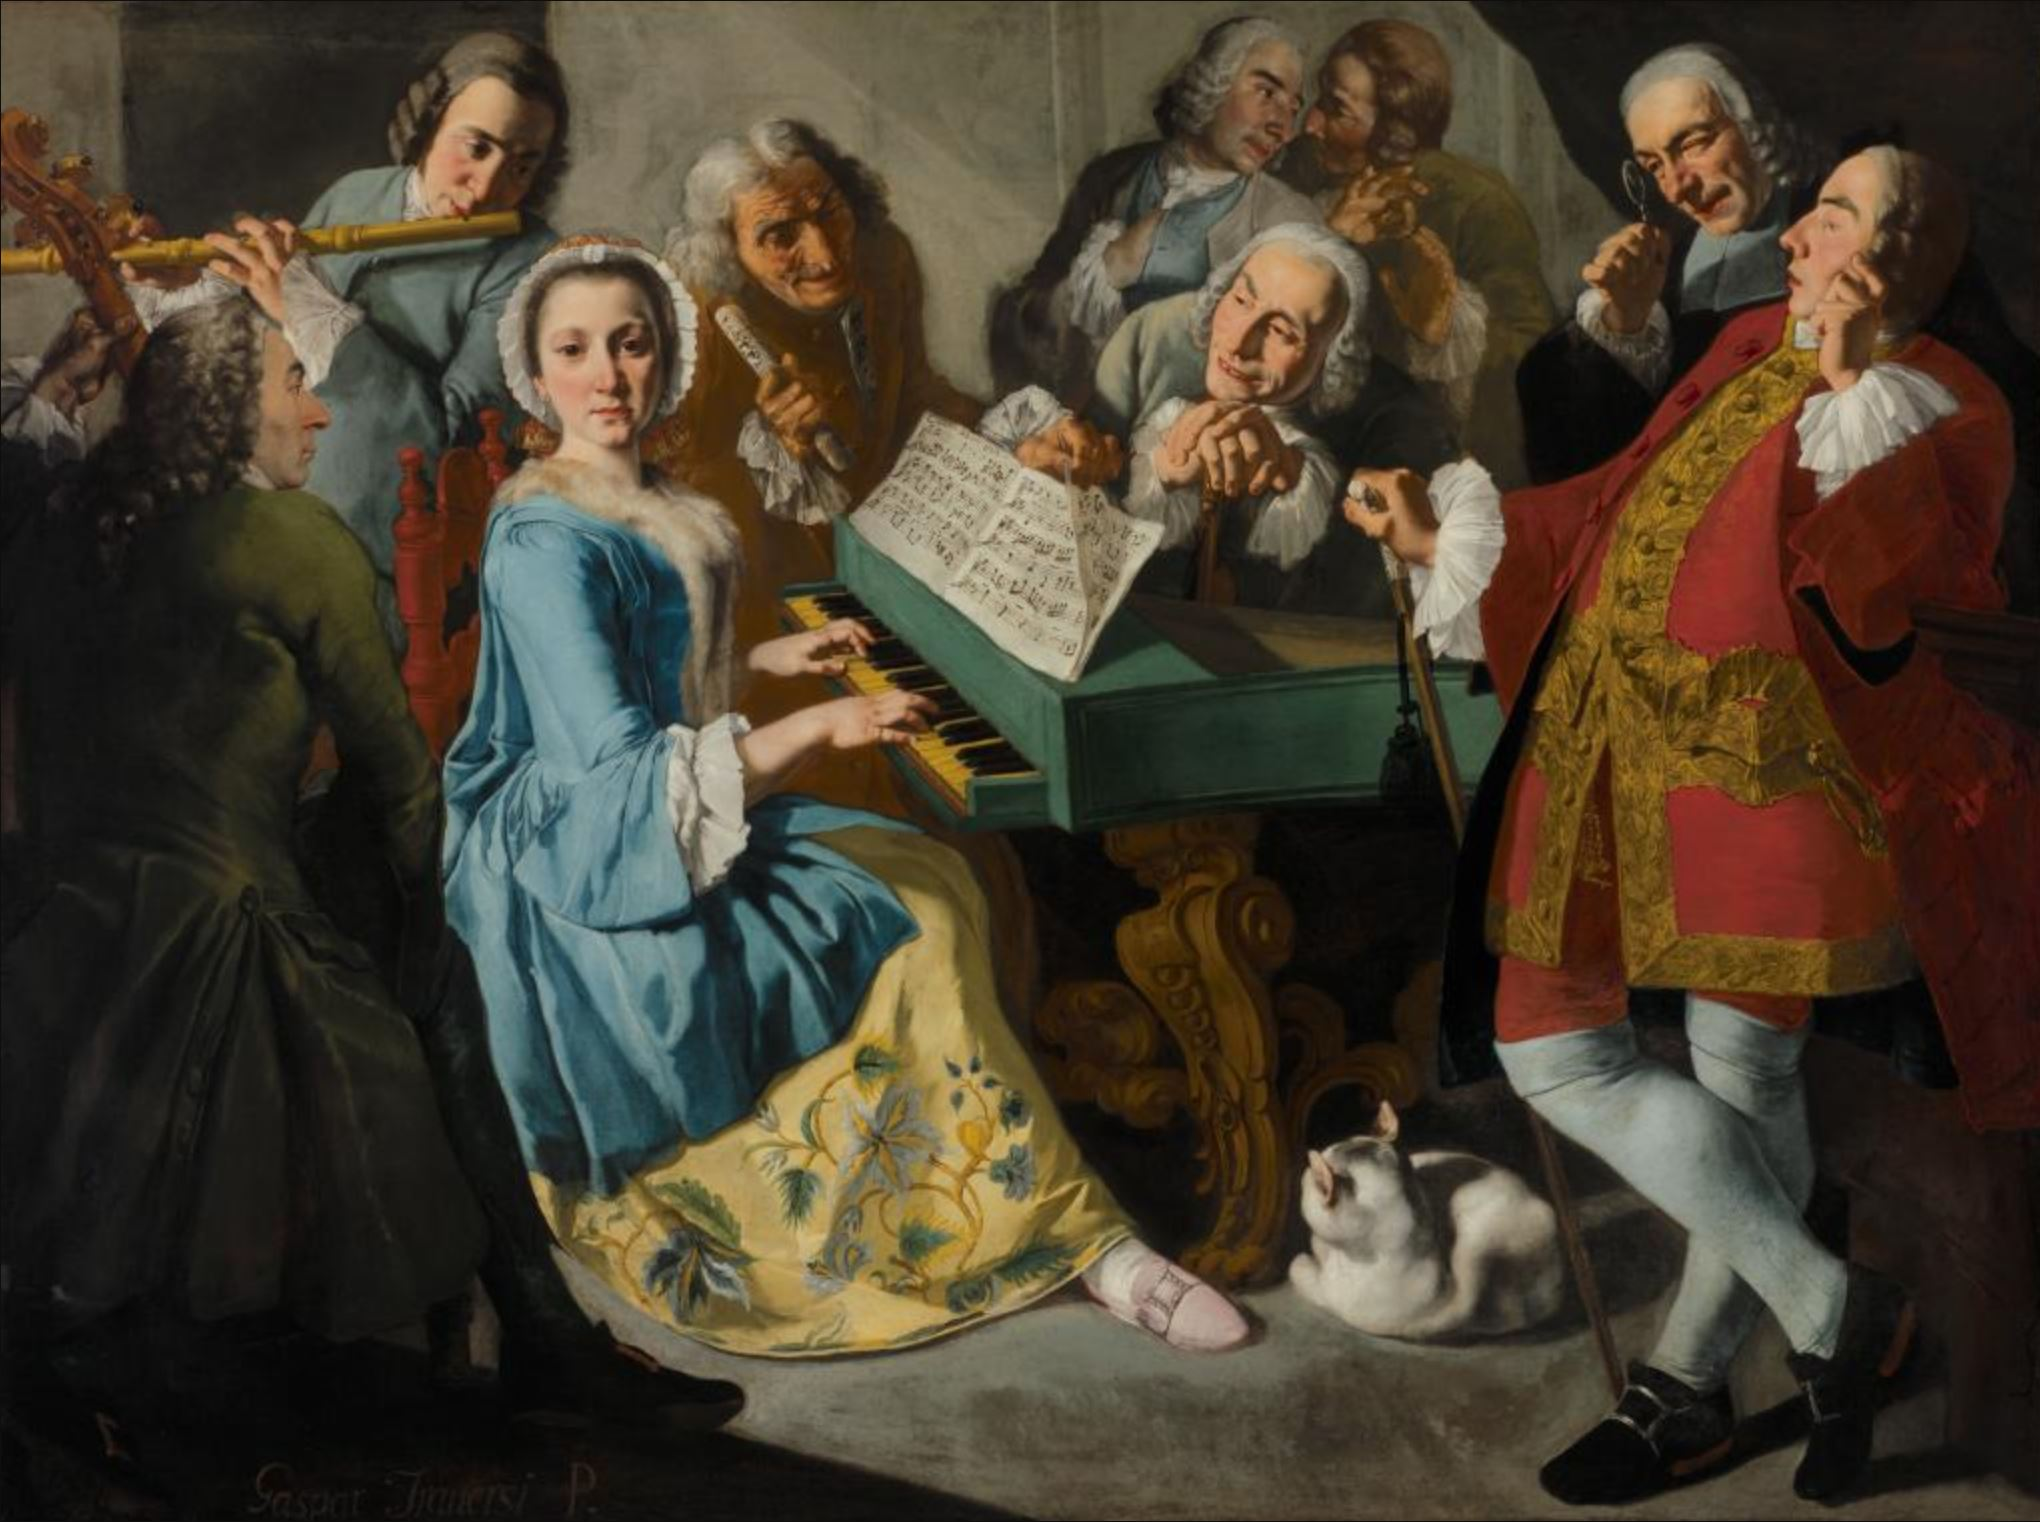 Traversi 1755-1760 La lecon de musique Nelson Atkins Museum Dallas